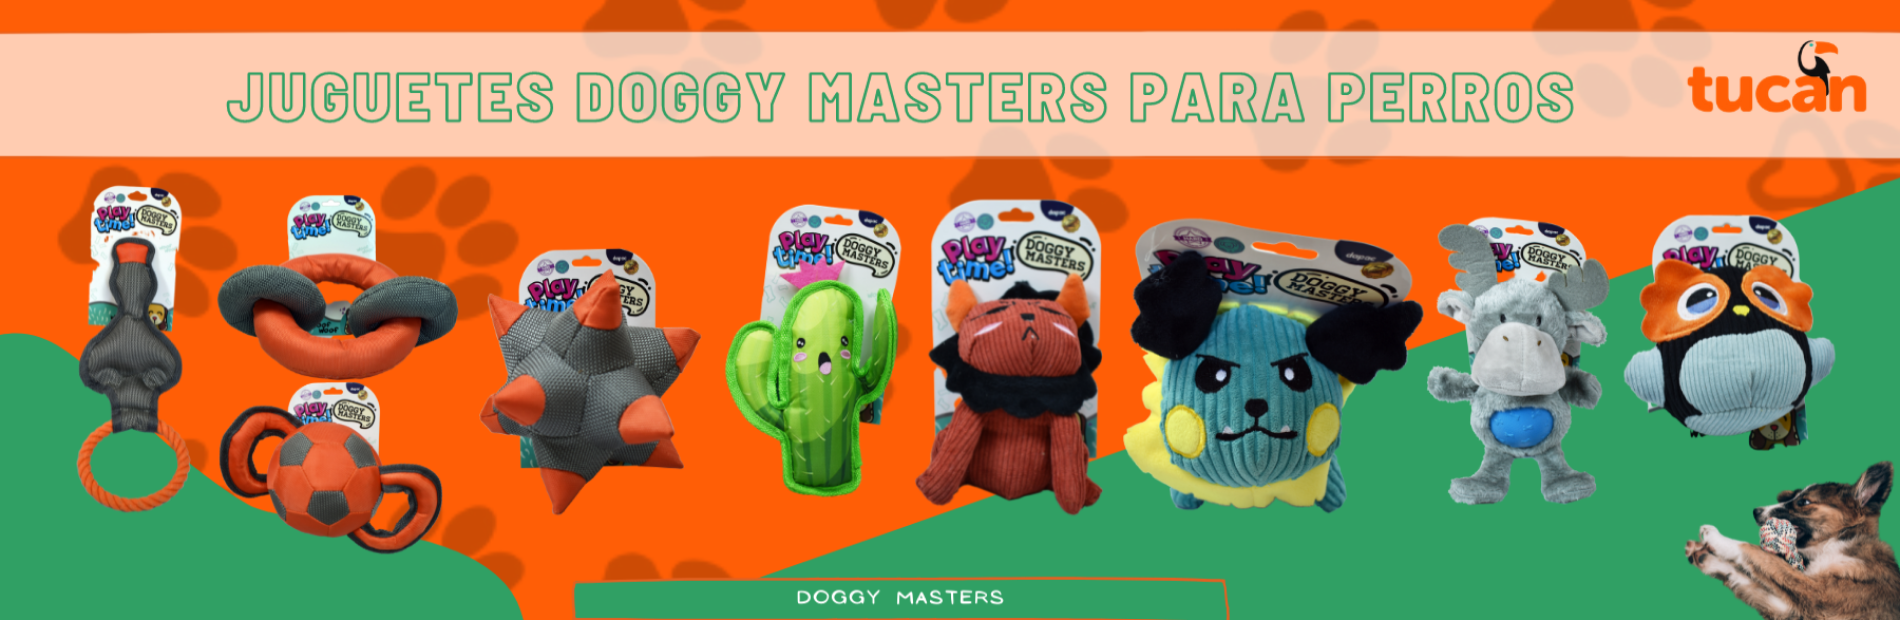 DOGGY MASTERS PERRO